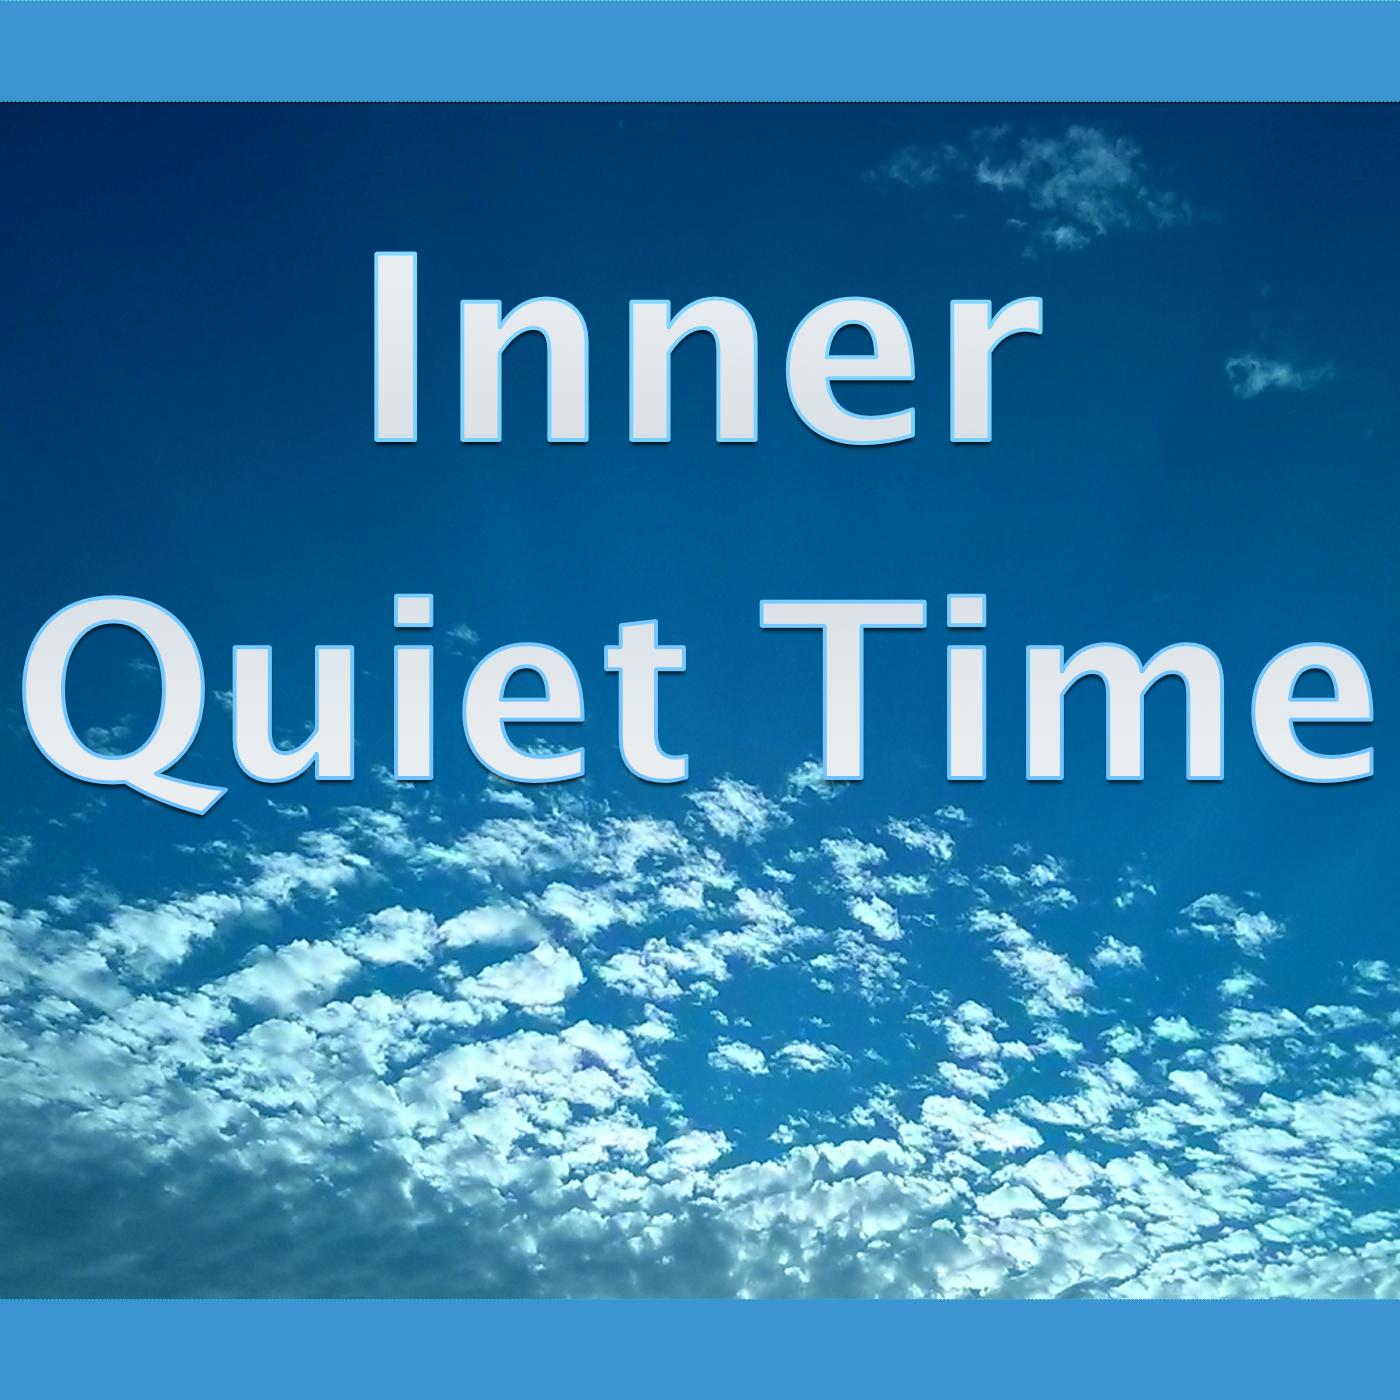 Inner Quiet Time